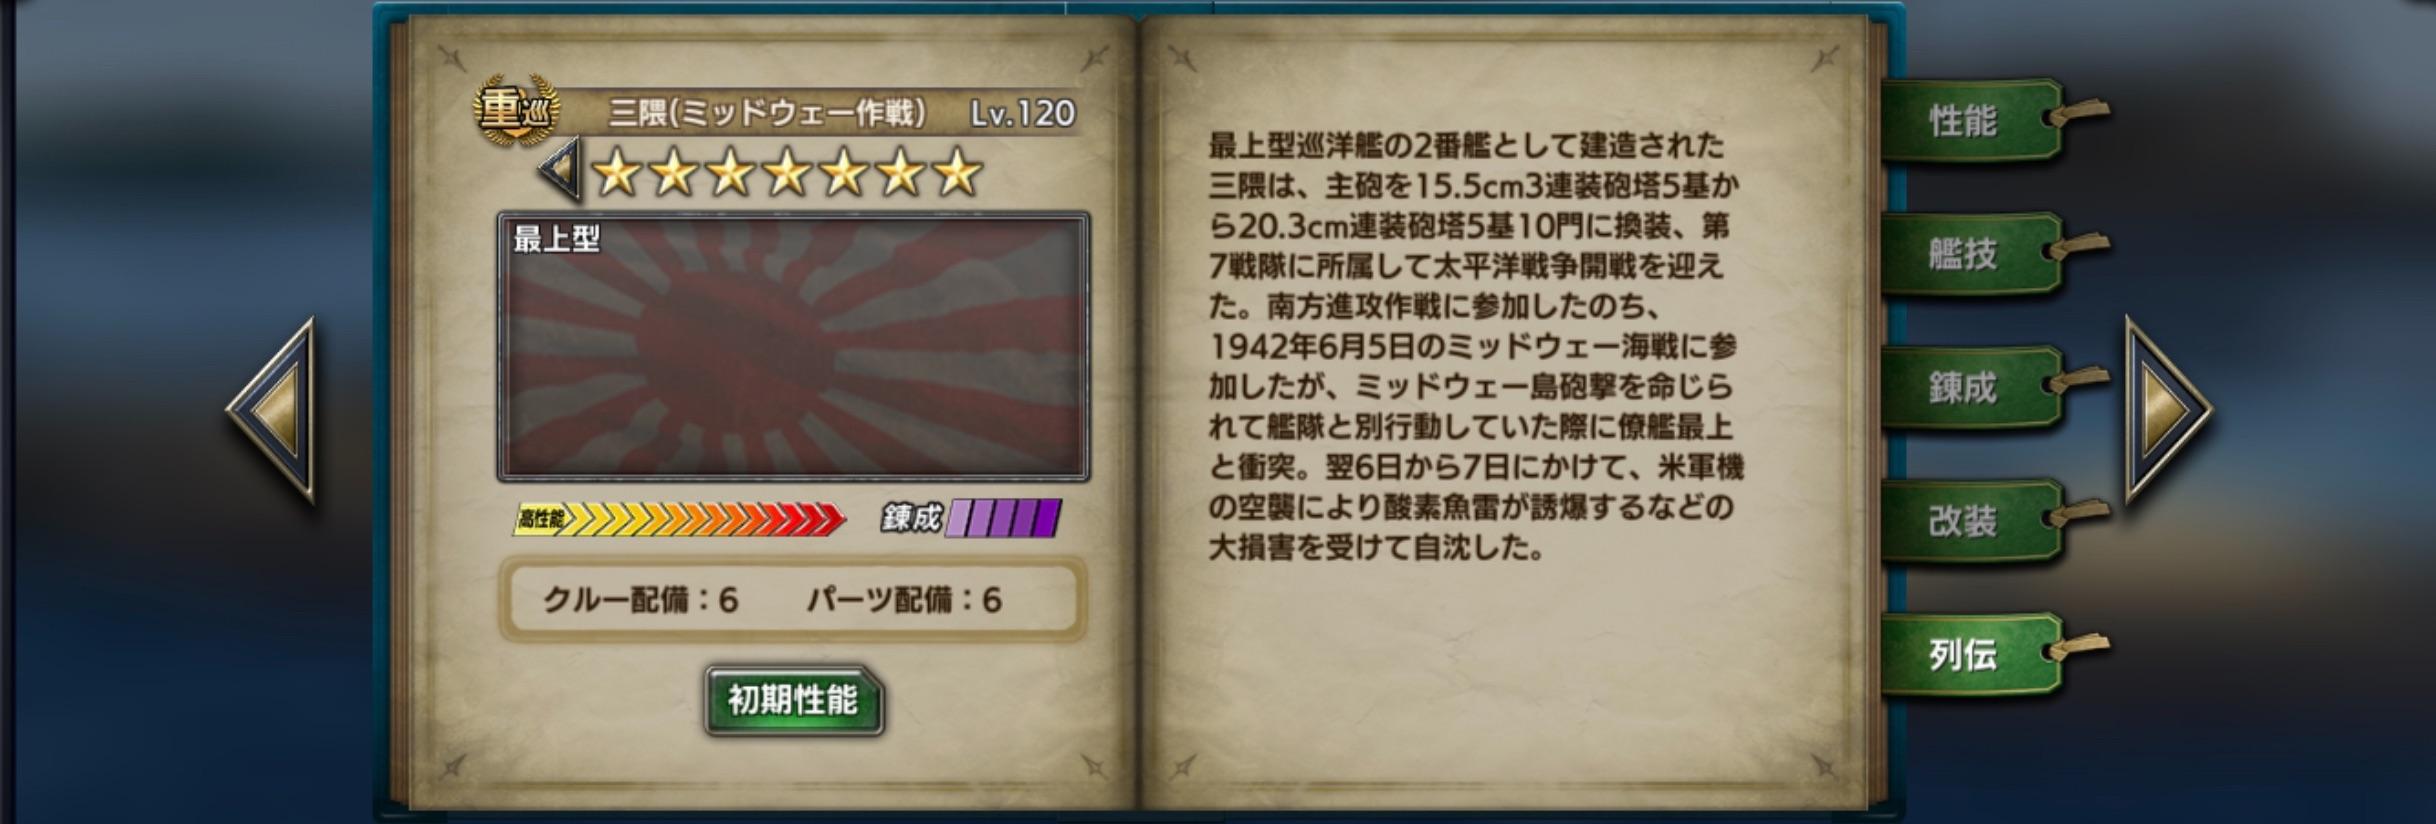 MikumaM-history